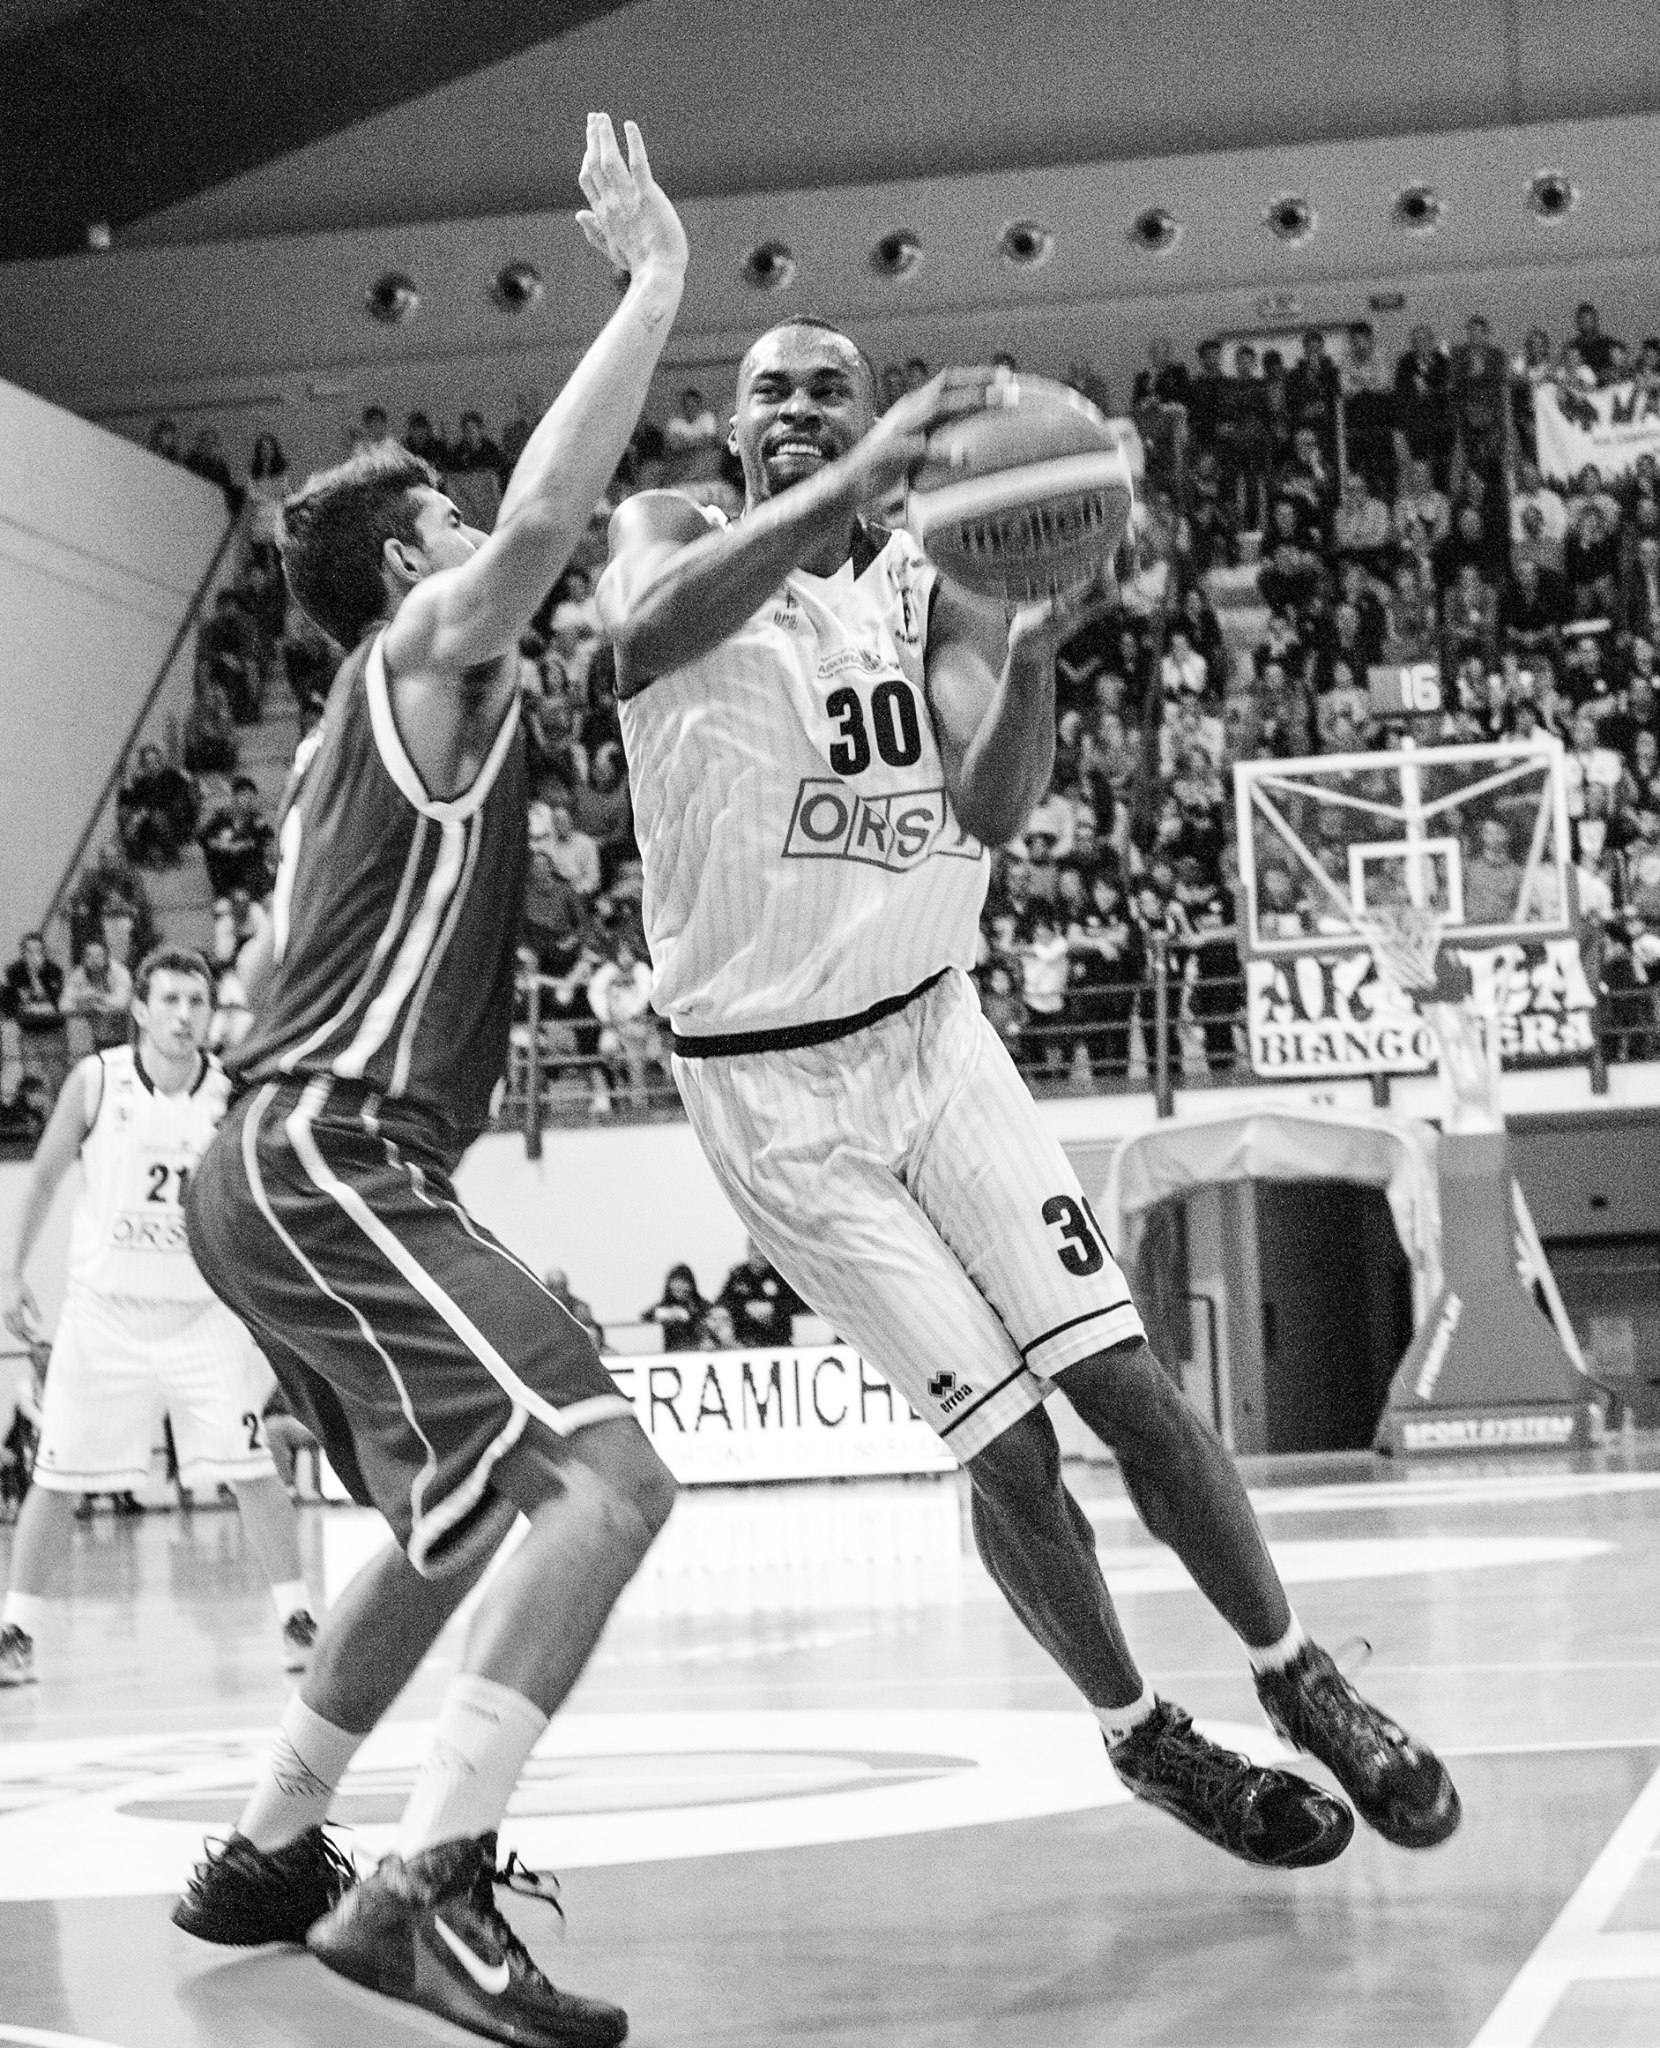 Derthona Basket - Jeffery Crockett